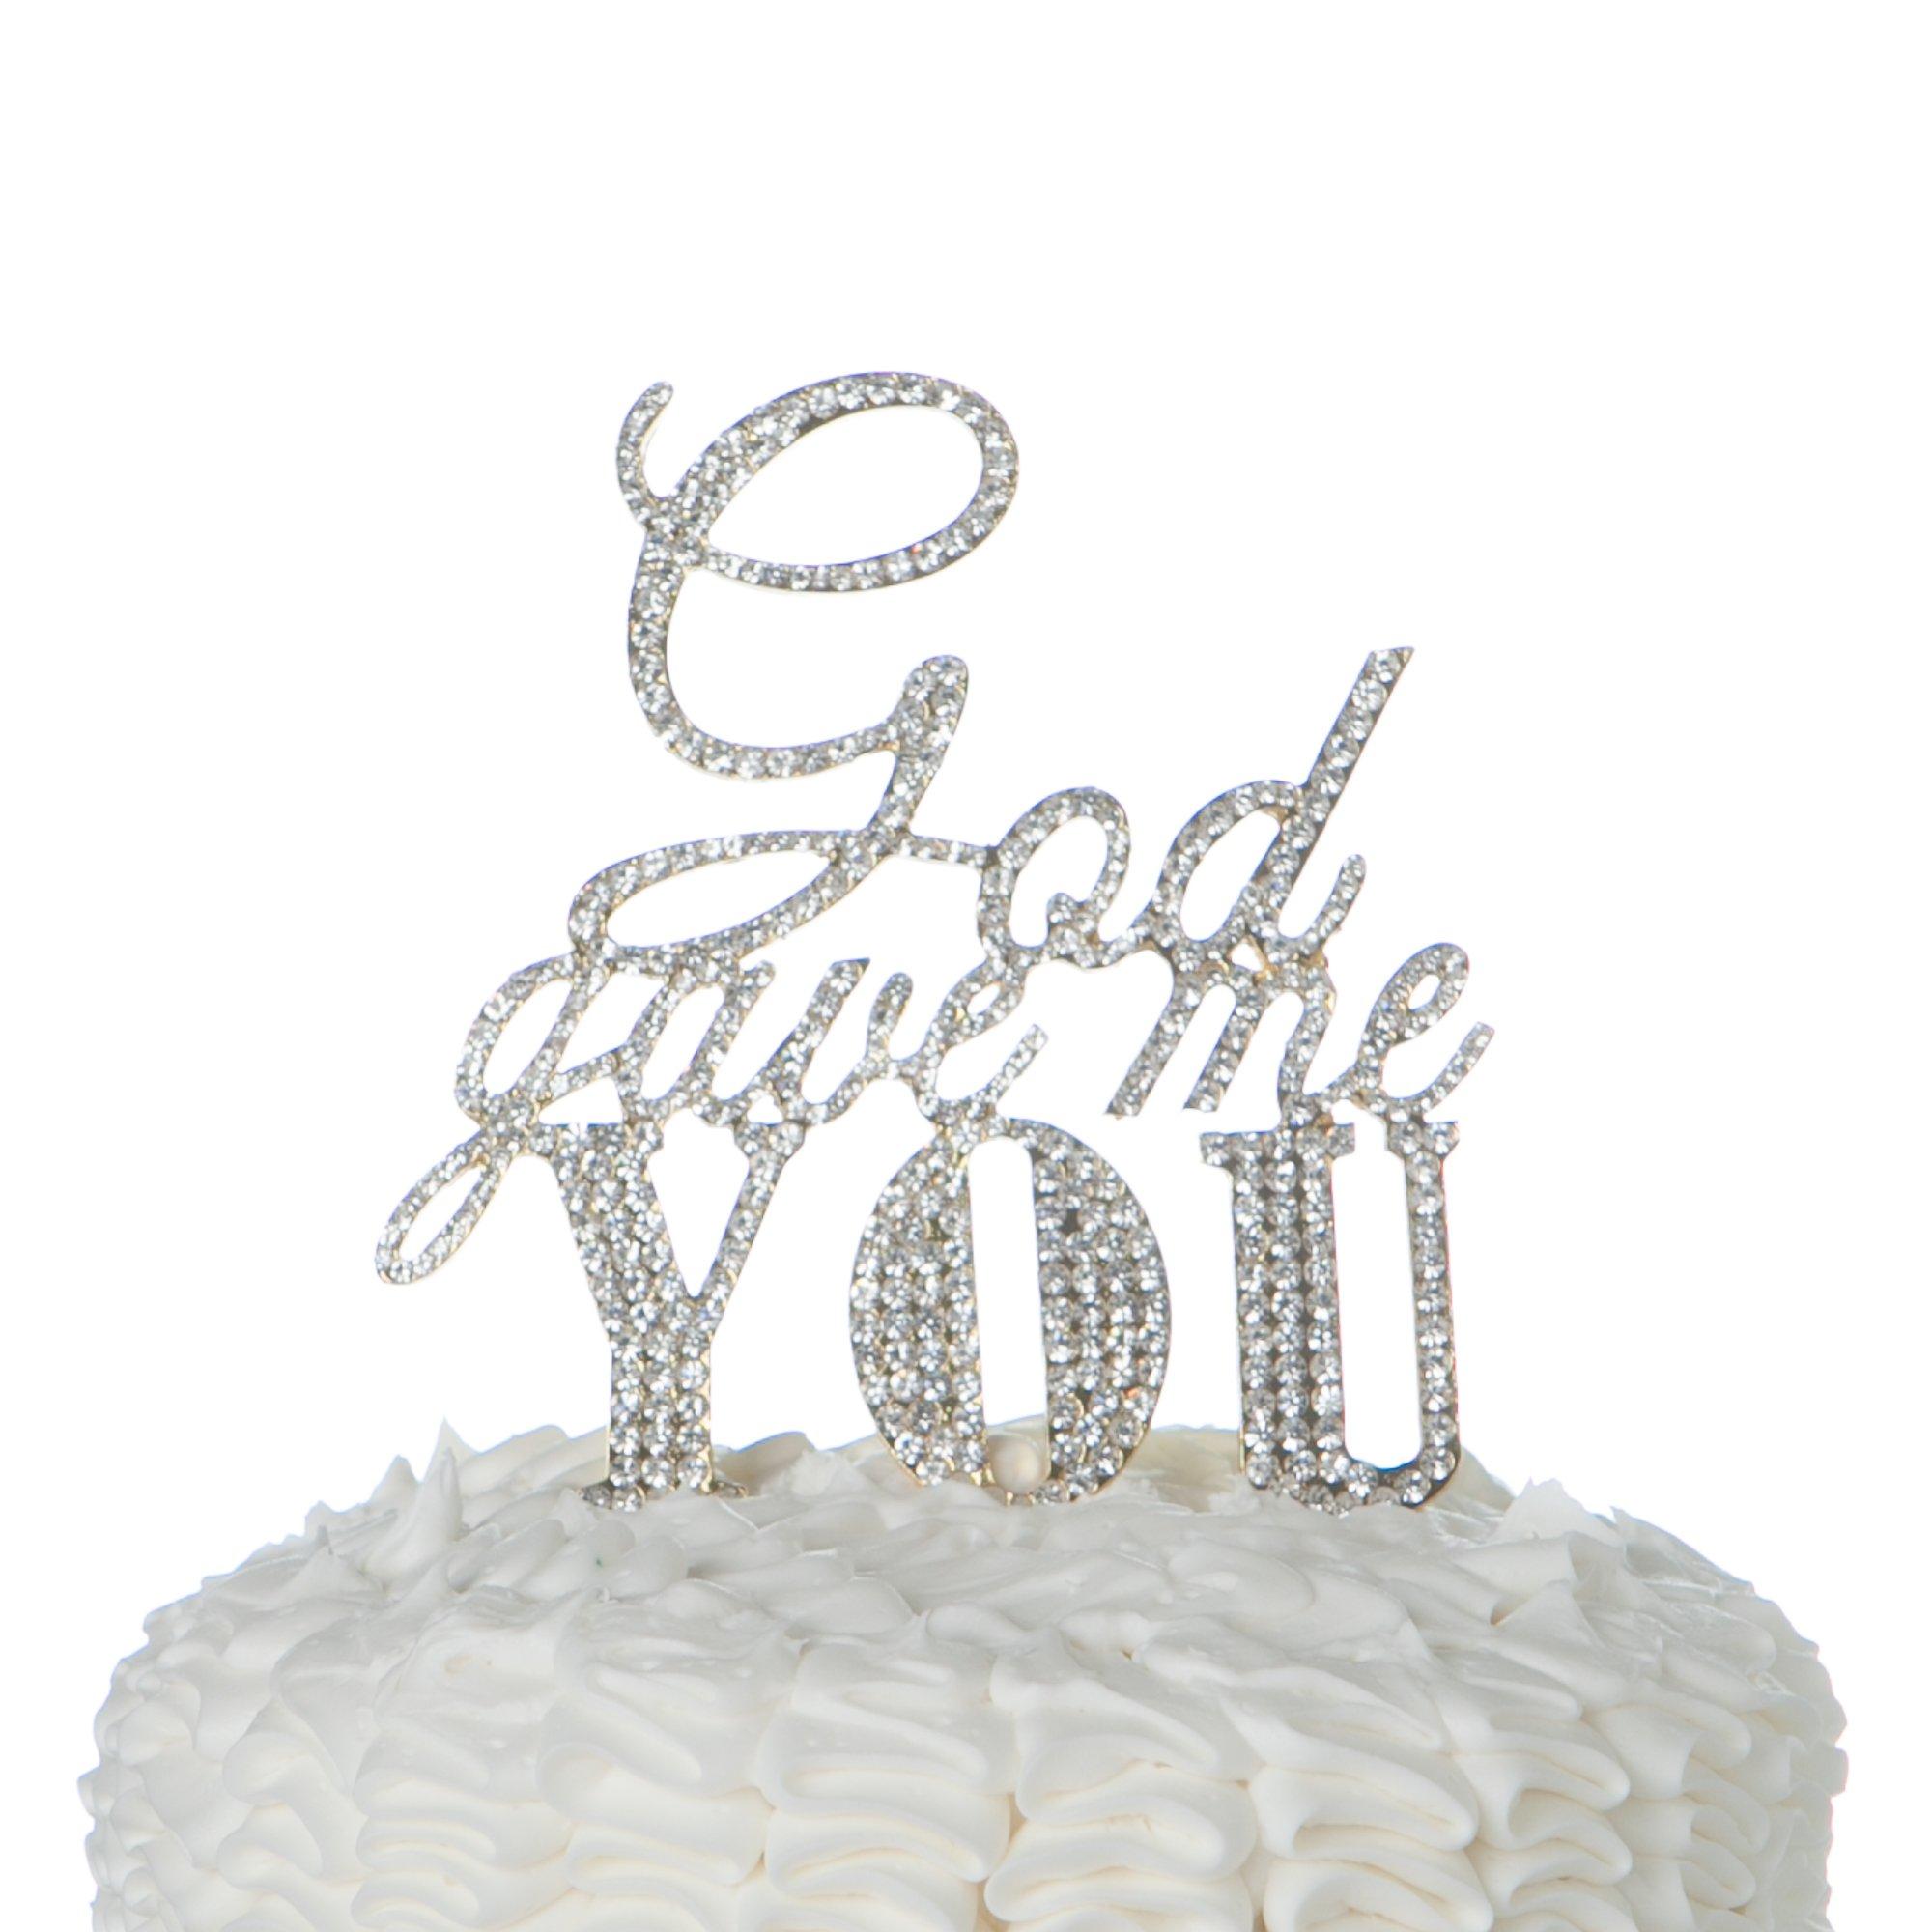 Ella Celebration God Gave Me You Cake Topper for Wedding or Anniversary, Gold Religious Christian Party Decoration by Ella Celebration